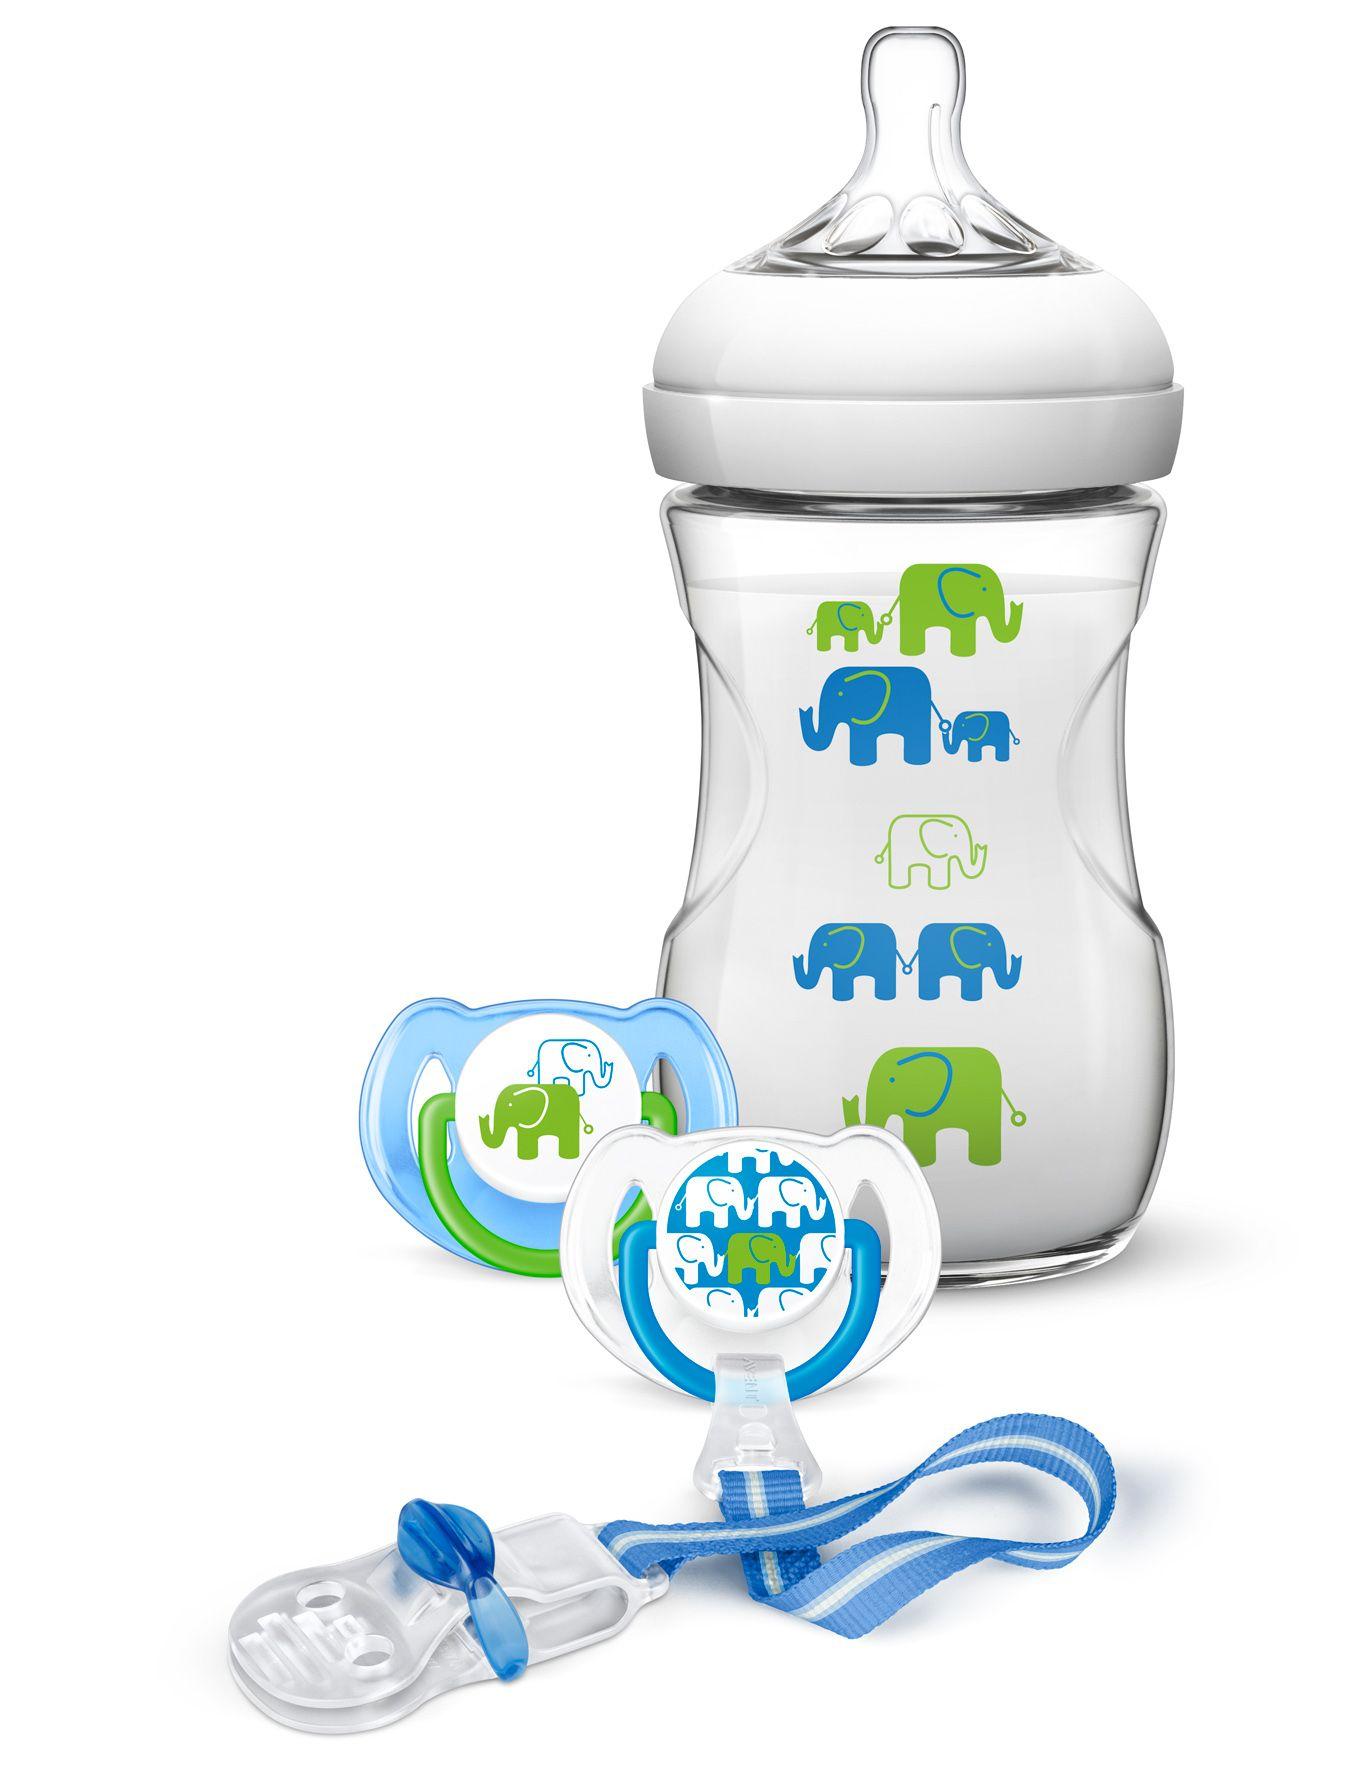 Philips Avent Sada Natural 260 ml Slon Varianta: chlapec